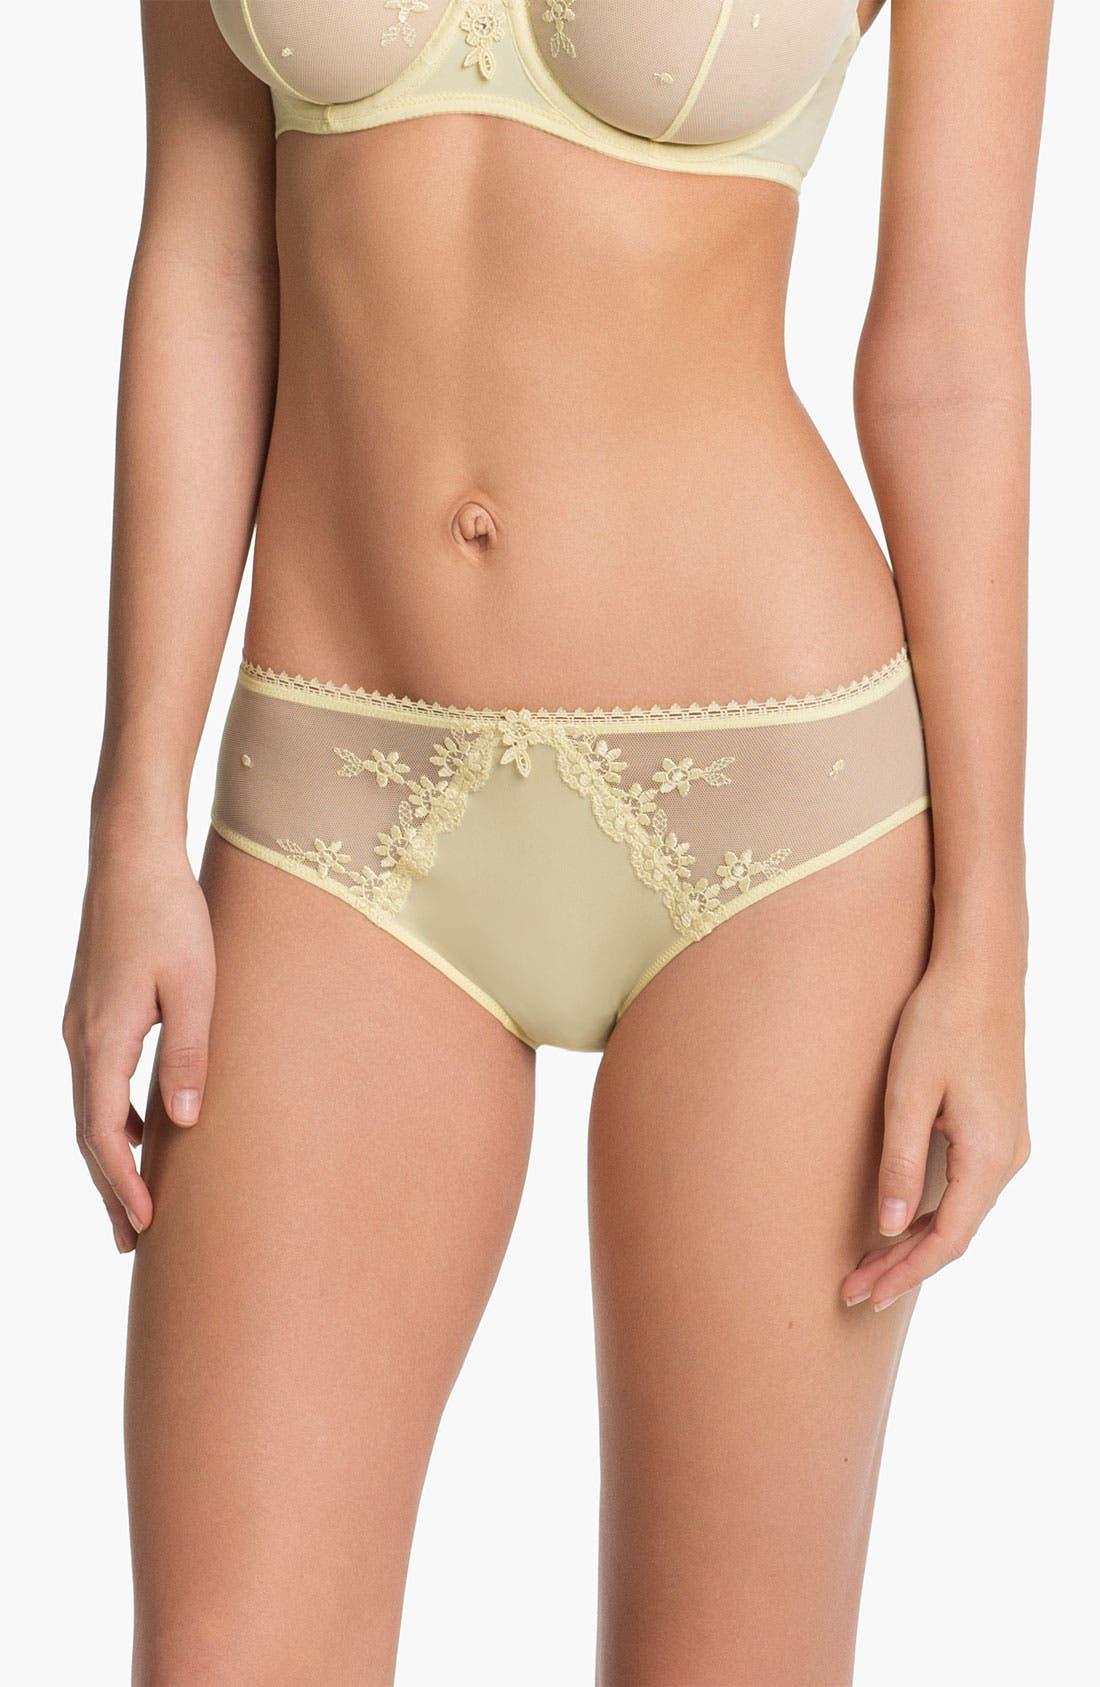 Alternate Image 1 Selected - Miss Studio by La Perla 'Midsummer Flirt' Bikini